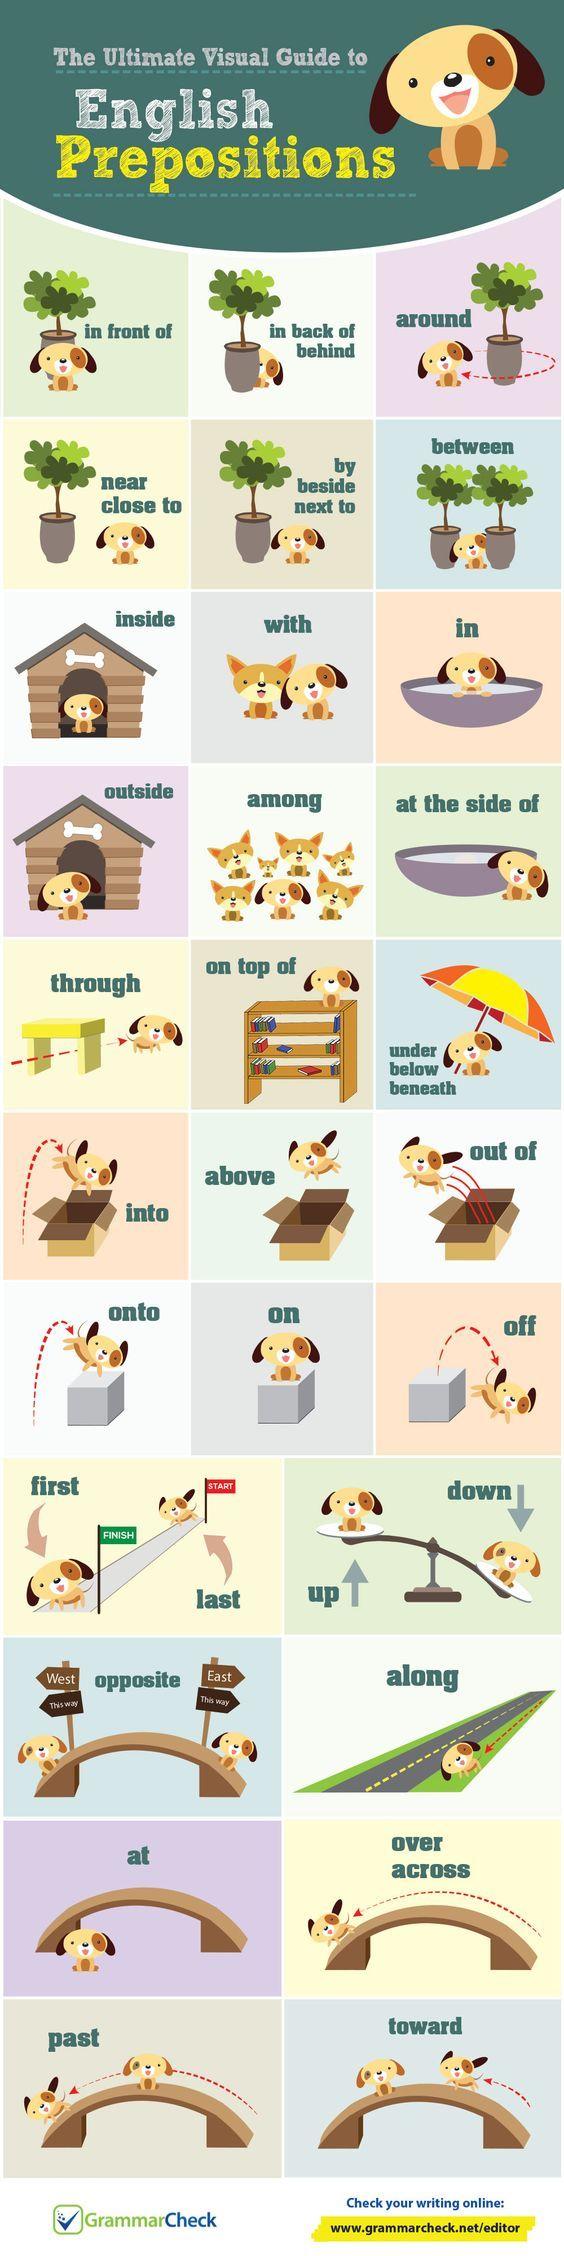 Guide to PREPOSITIONS #learnenglish